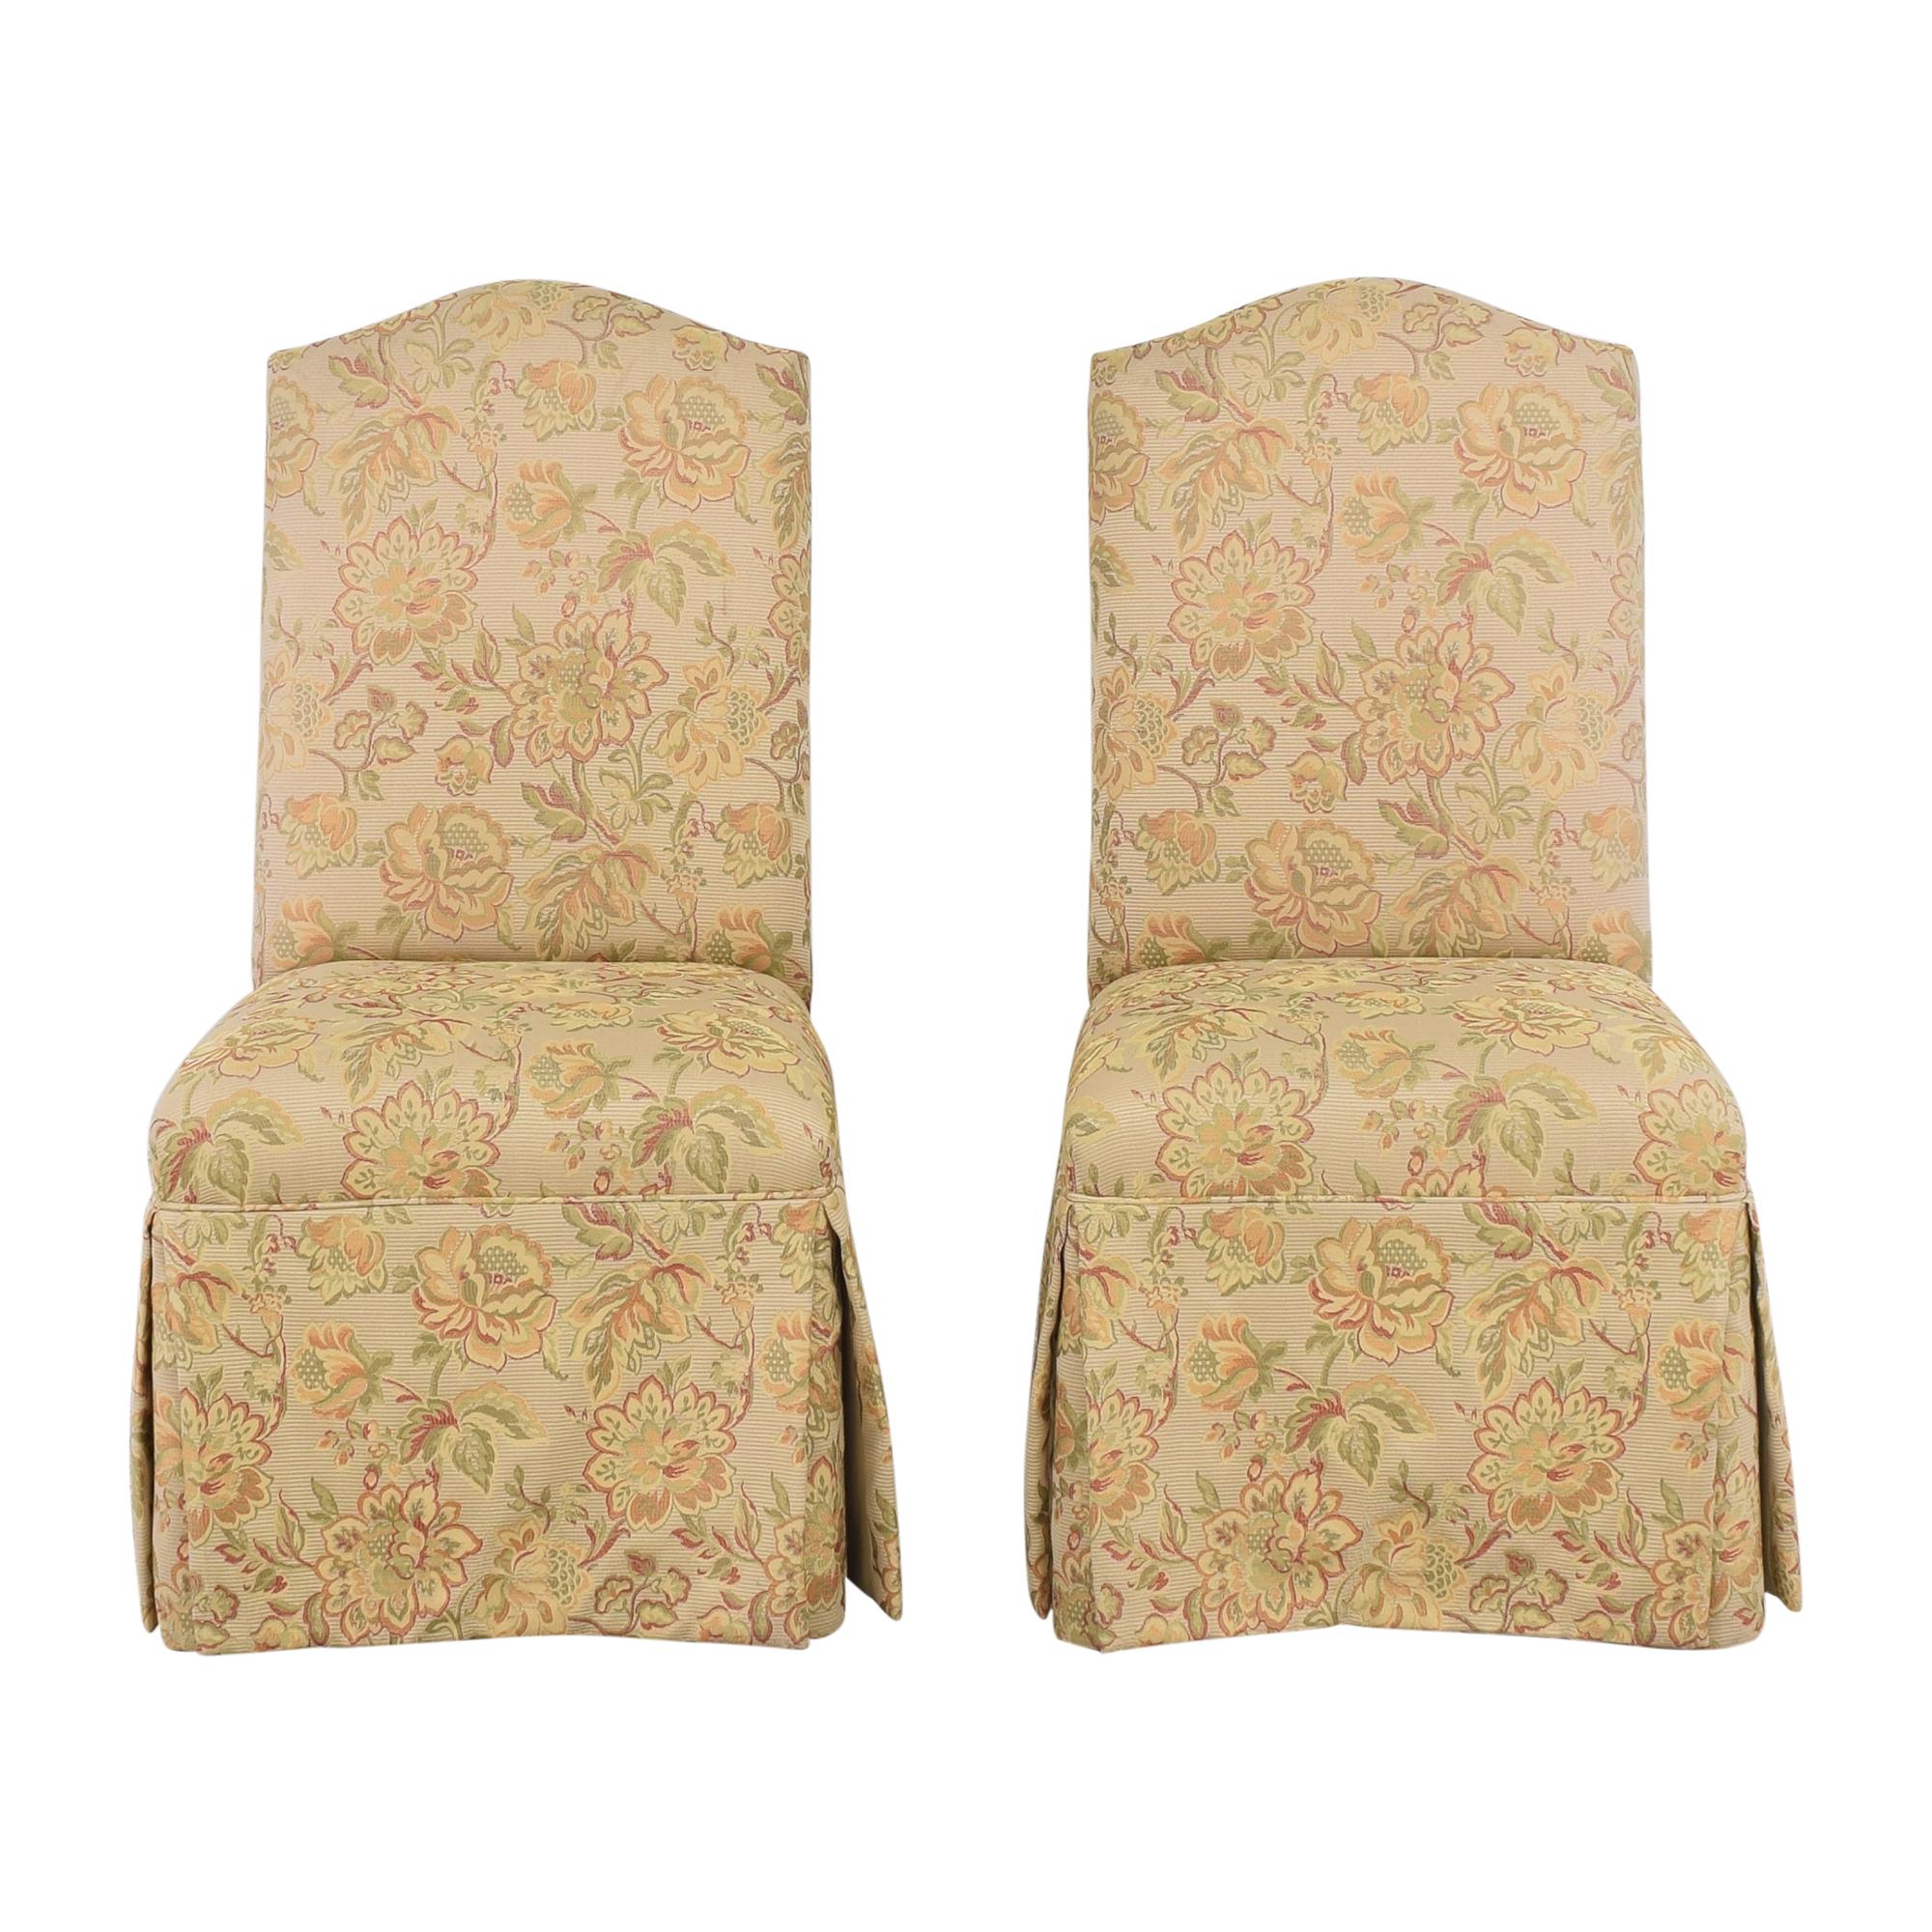 Grange Grange Skirted Dining Side Chairs used